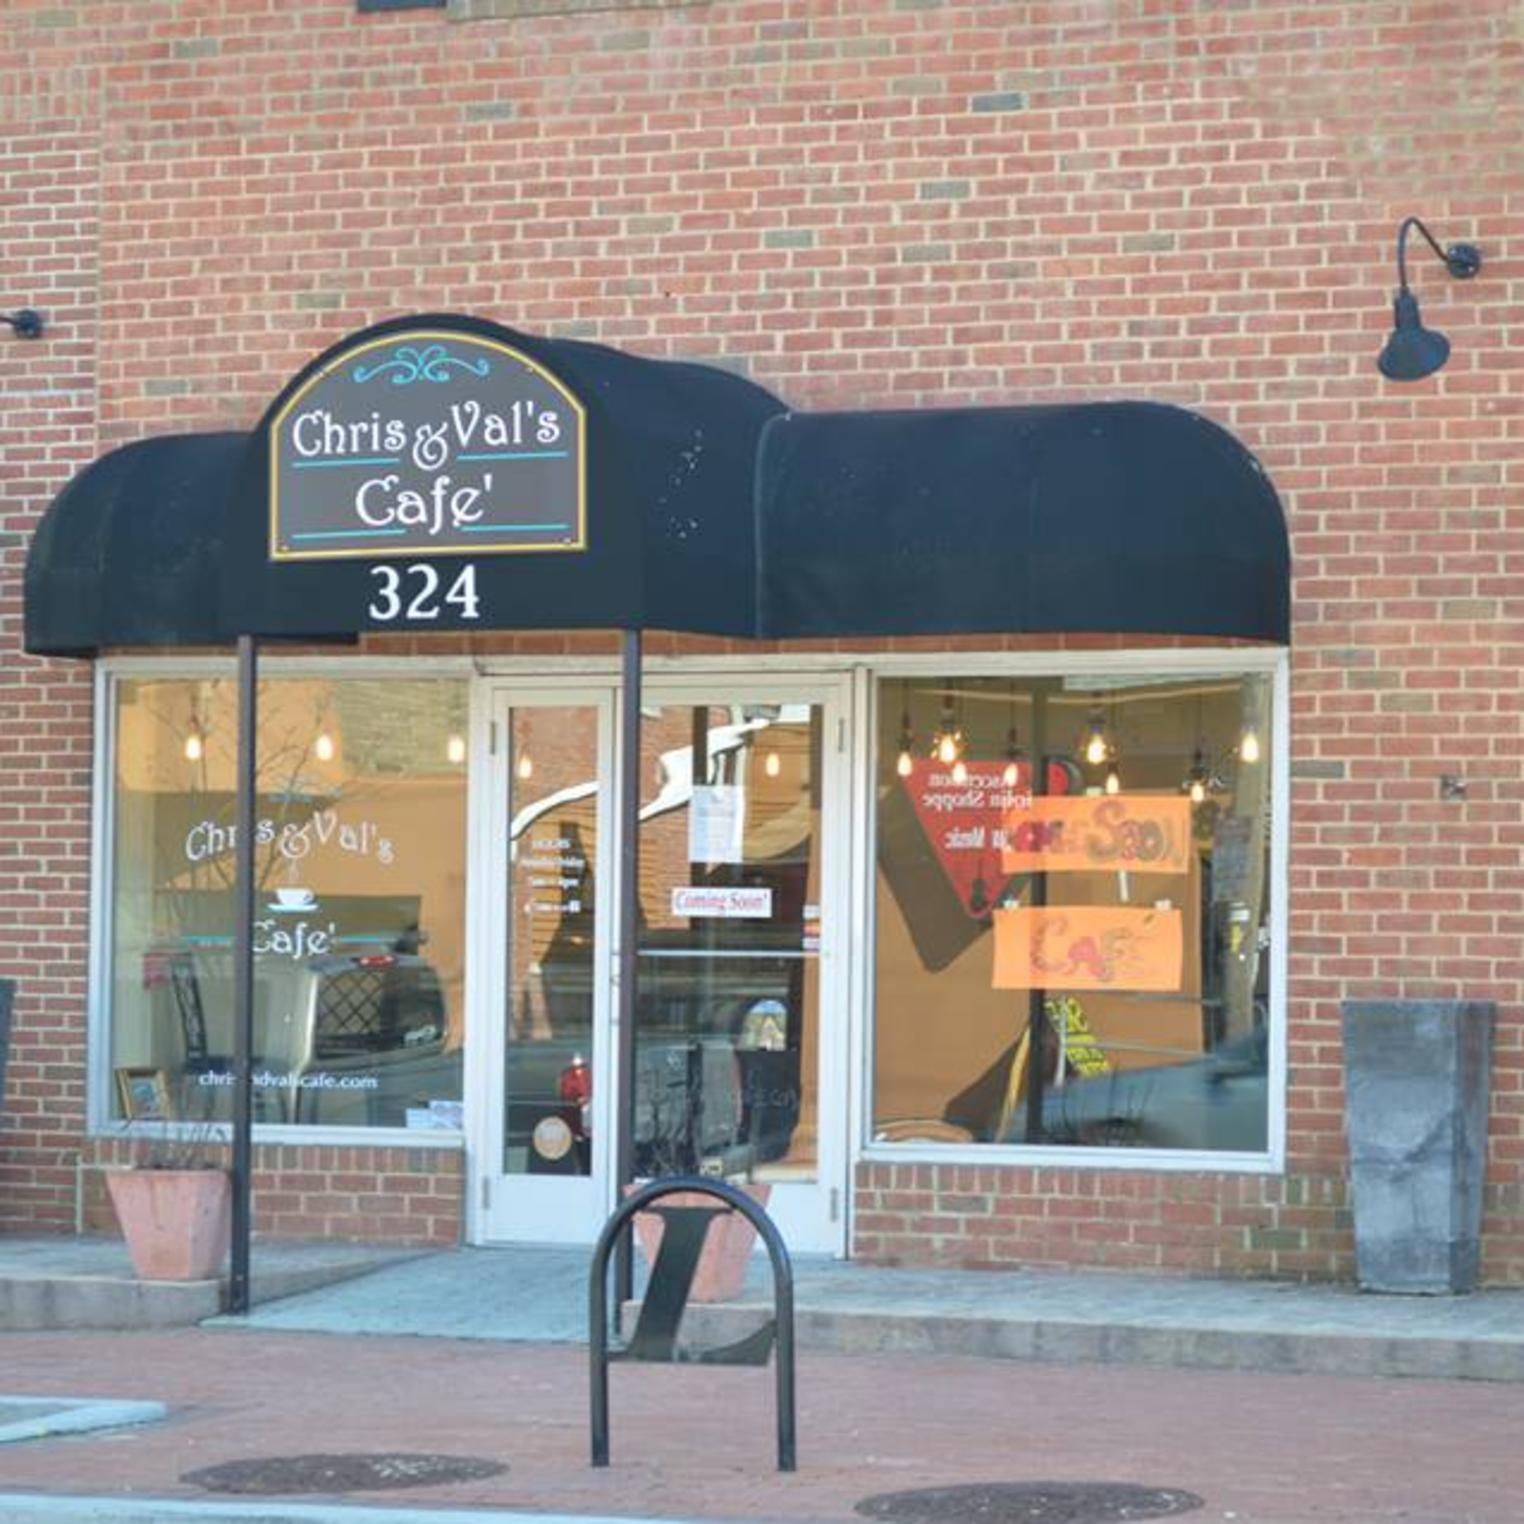 Chris & Val's Cafe